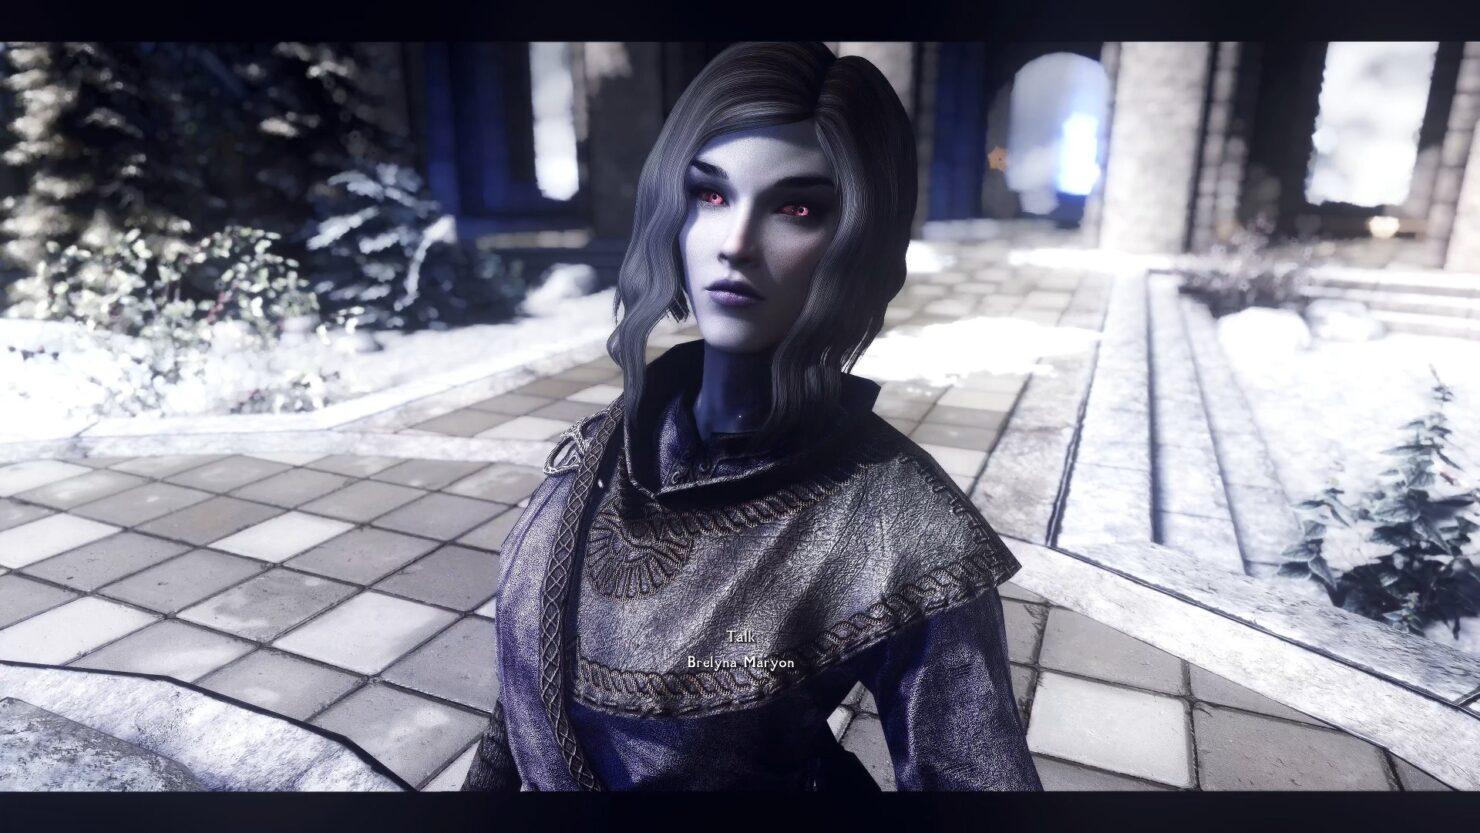 skyrim-modpocalypse-mod-3